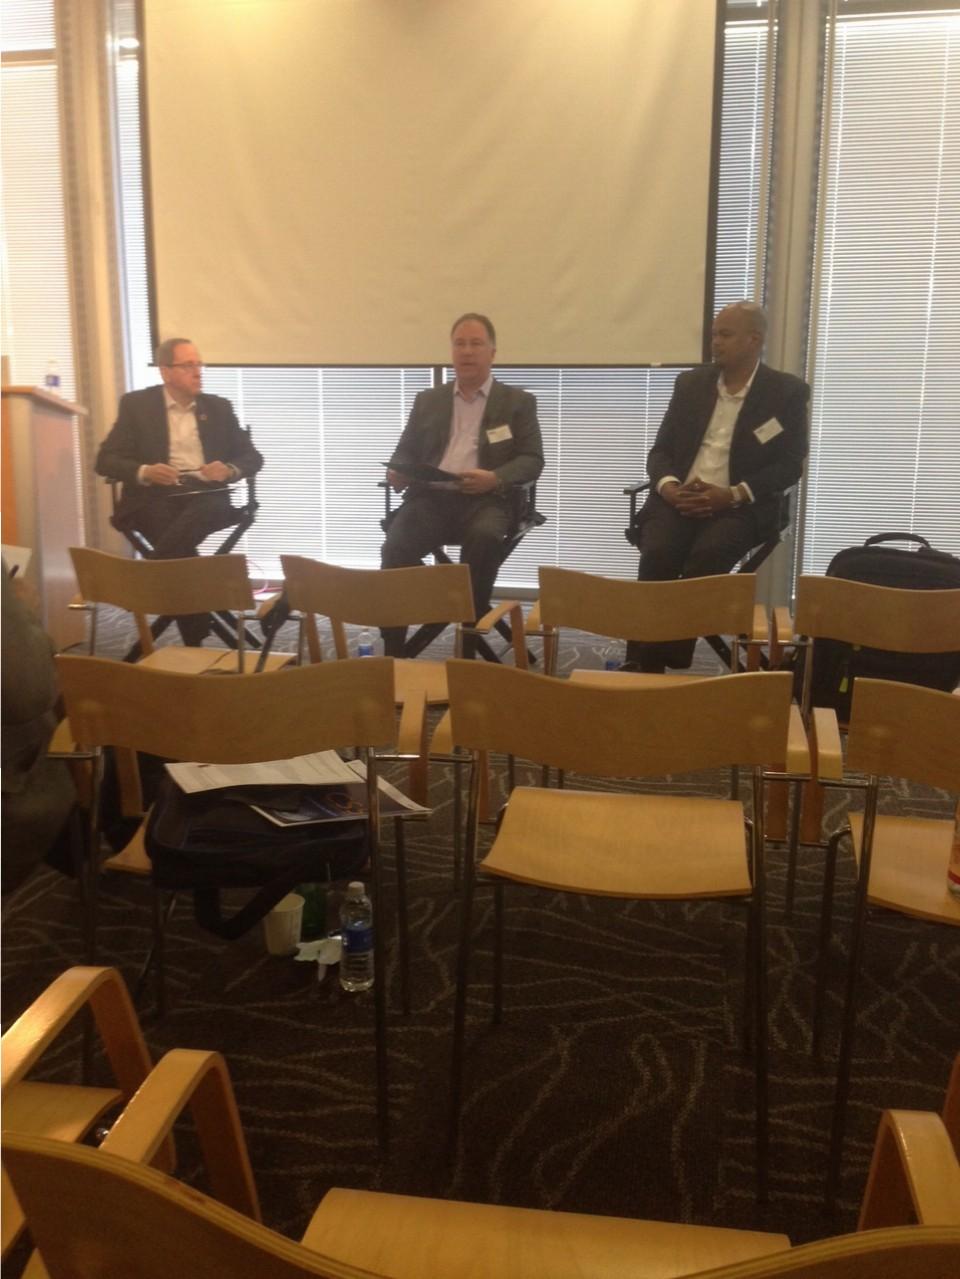 The CISOs panel from left to right, David Finn (Symantec), Tom August (John Muir Health), and Auston Davis (Stanford Children's Health).